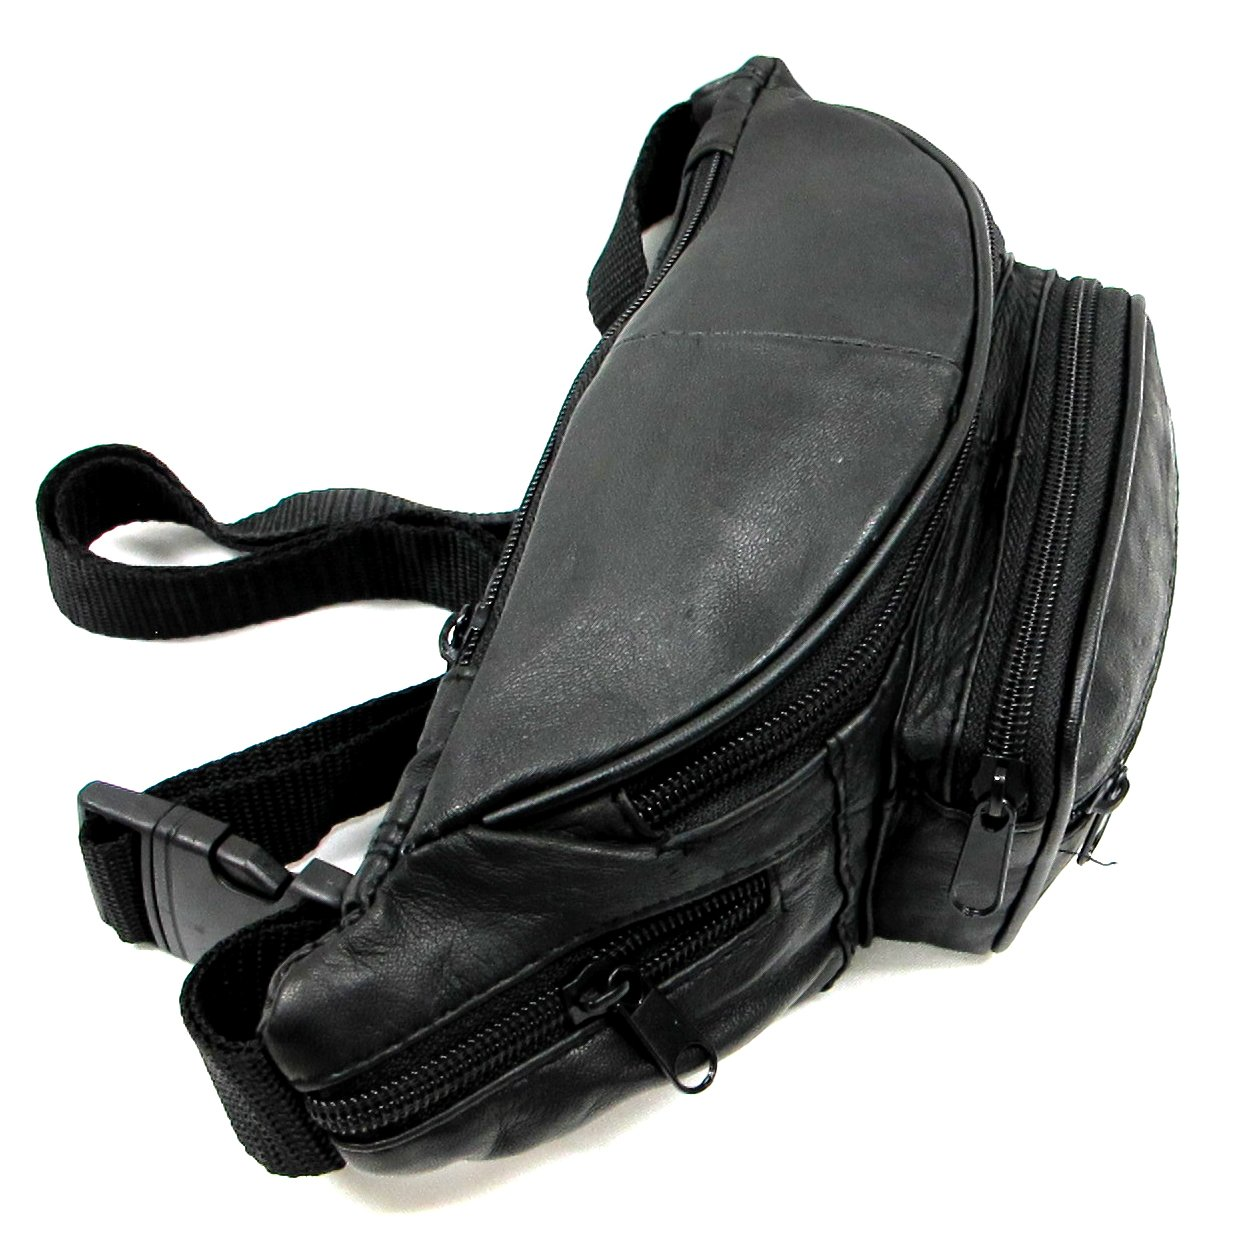 6 Zipper Pockets Genuine Soft Leather Fanny Pack Waist Bag Small Size Black